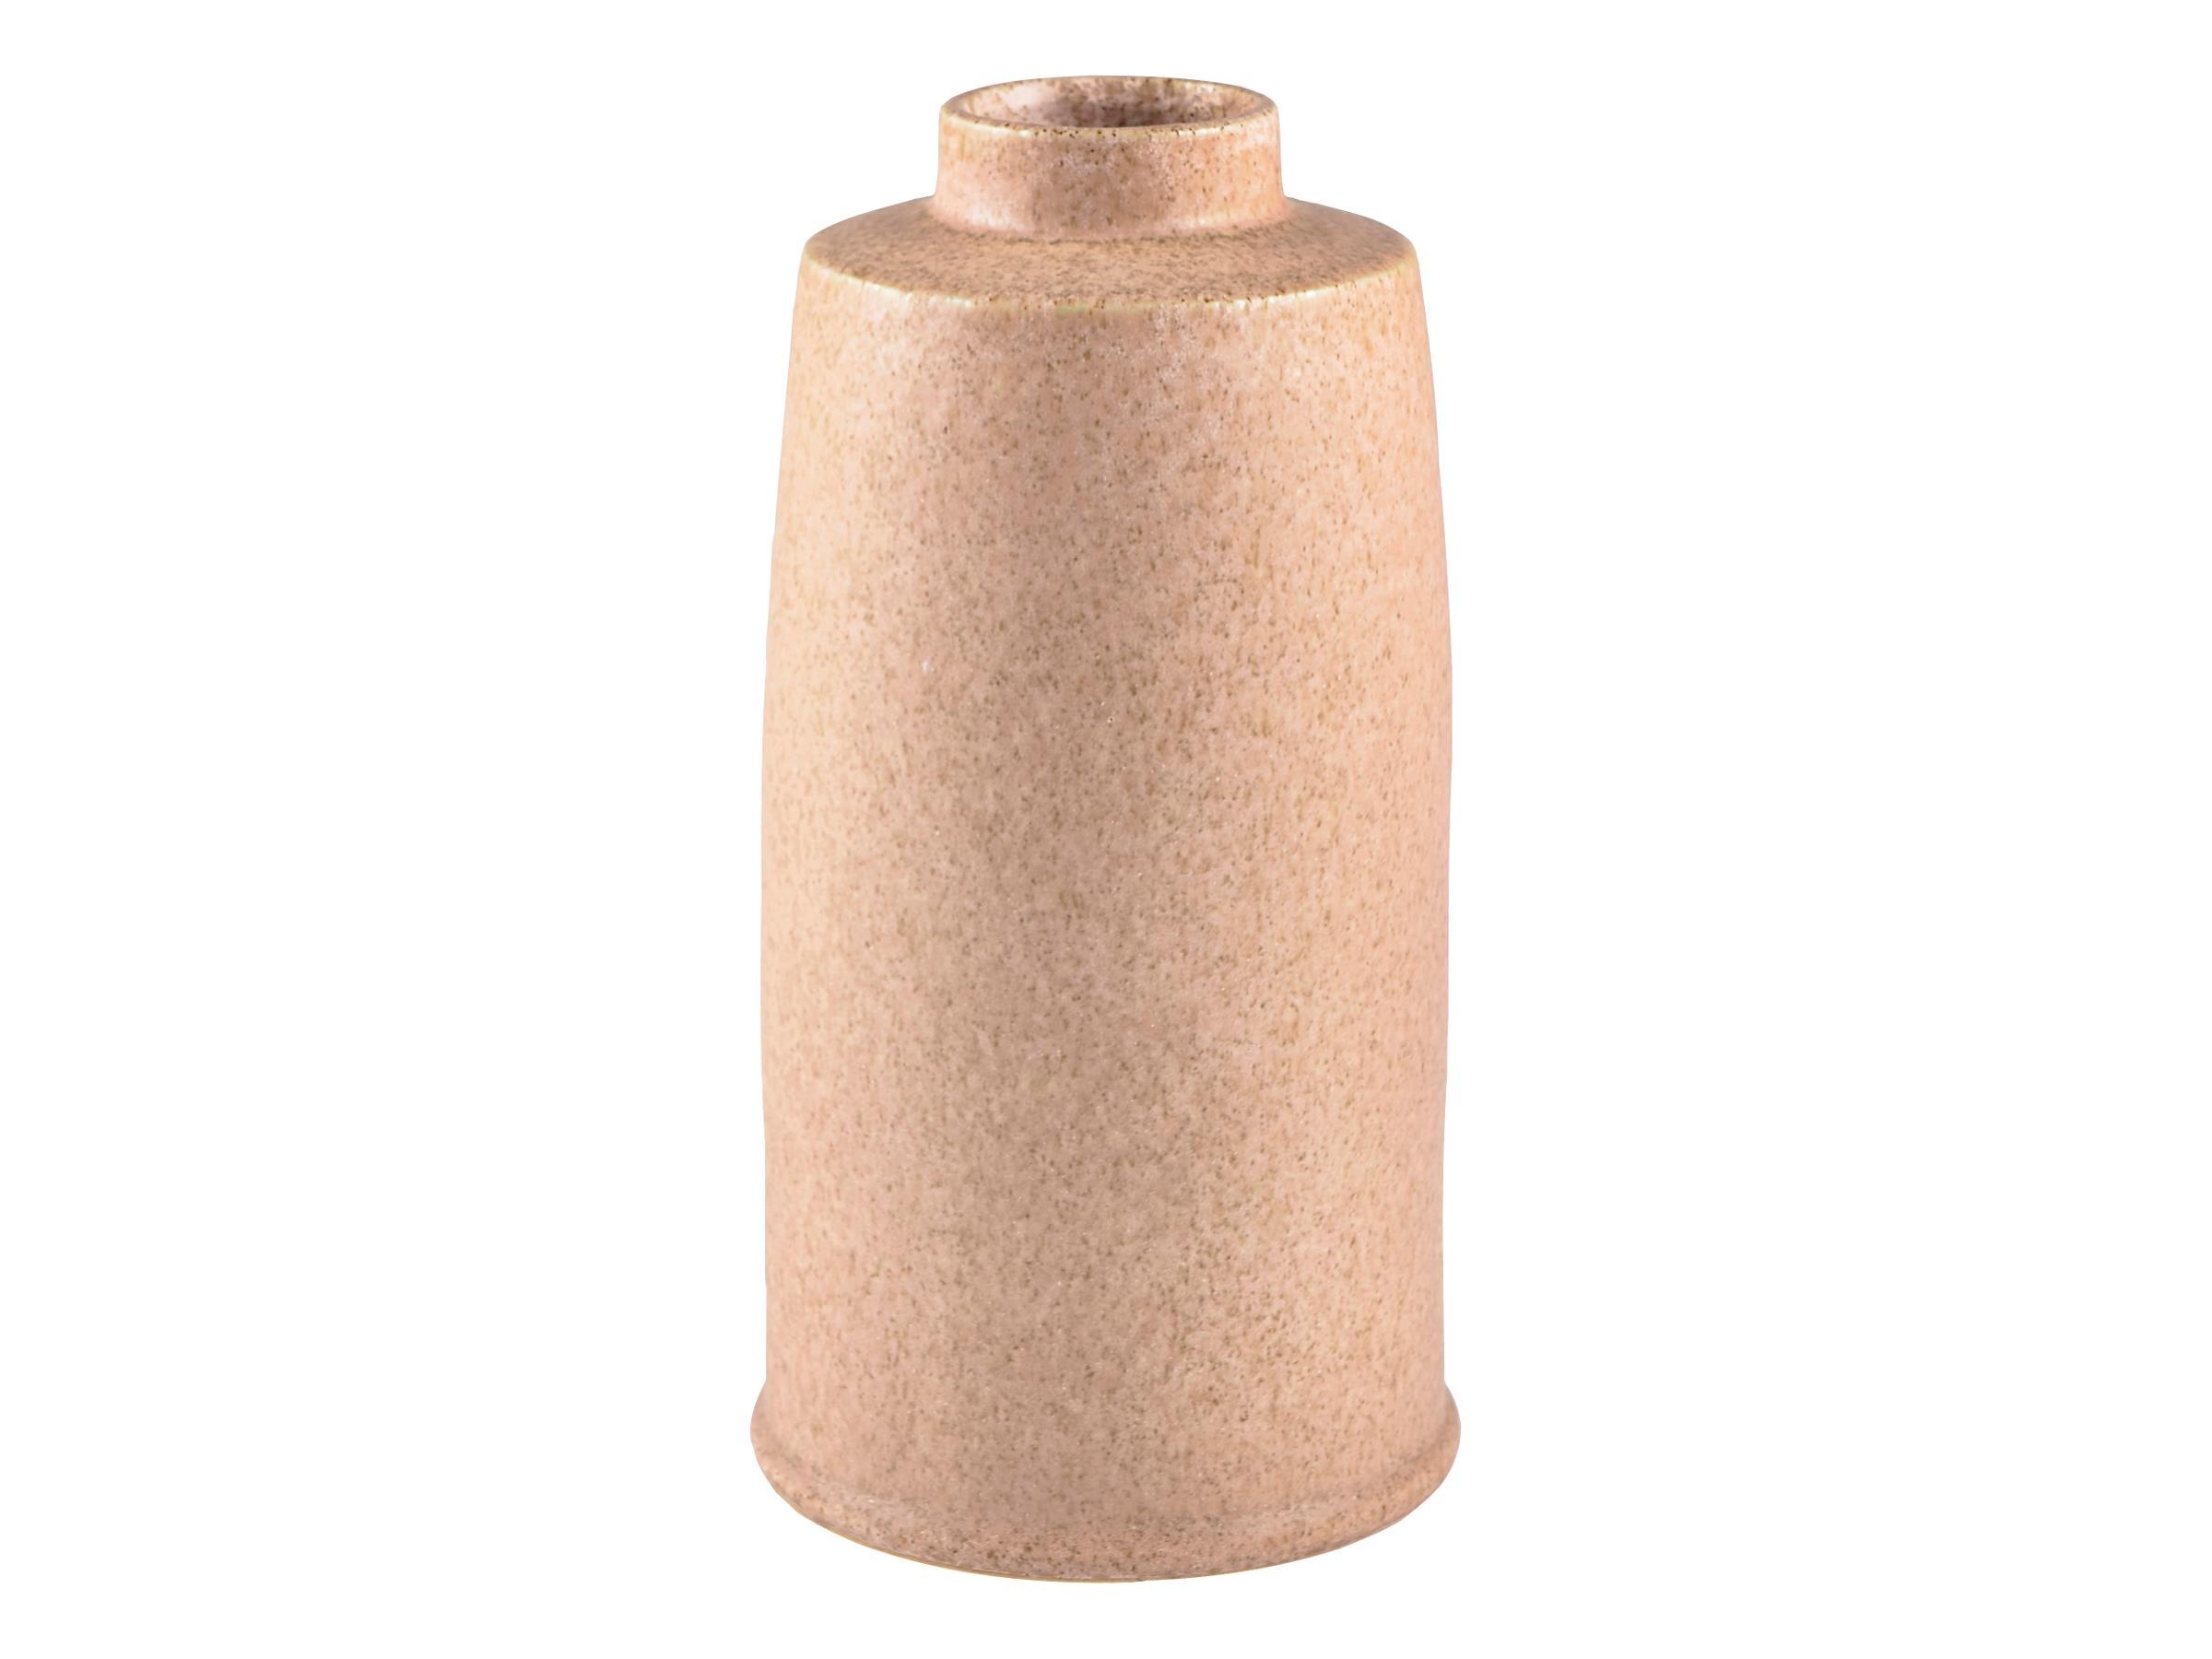 Vaza decorativa din ceramica Stone Round Large 12433 Natural, Ø12,5xH24,5 cm, Villa Collection